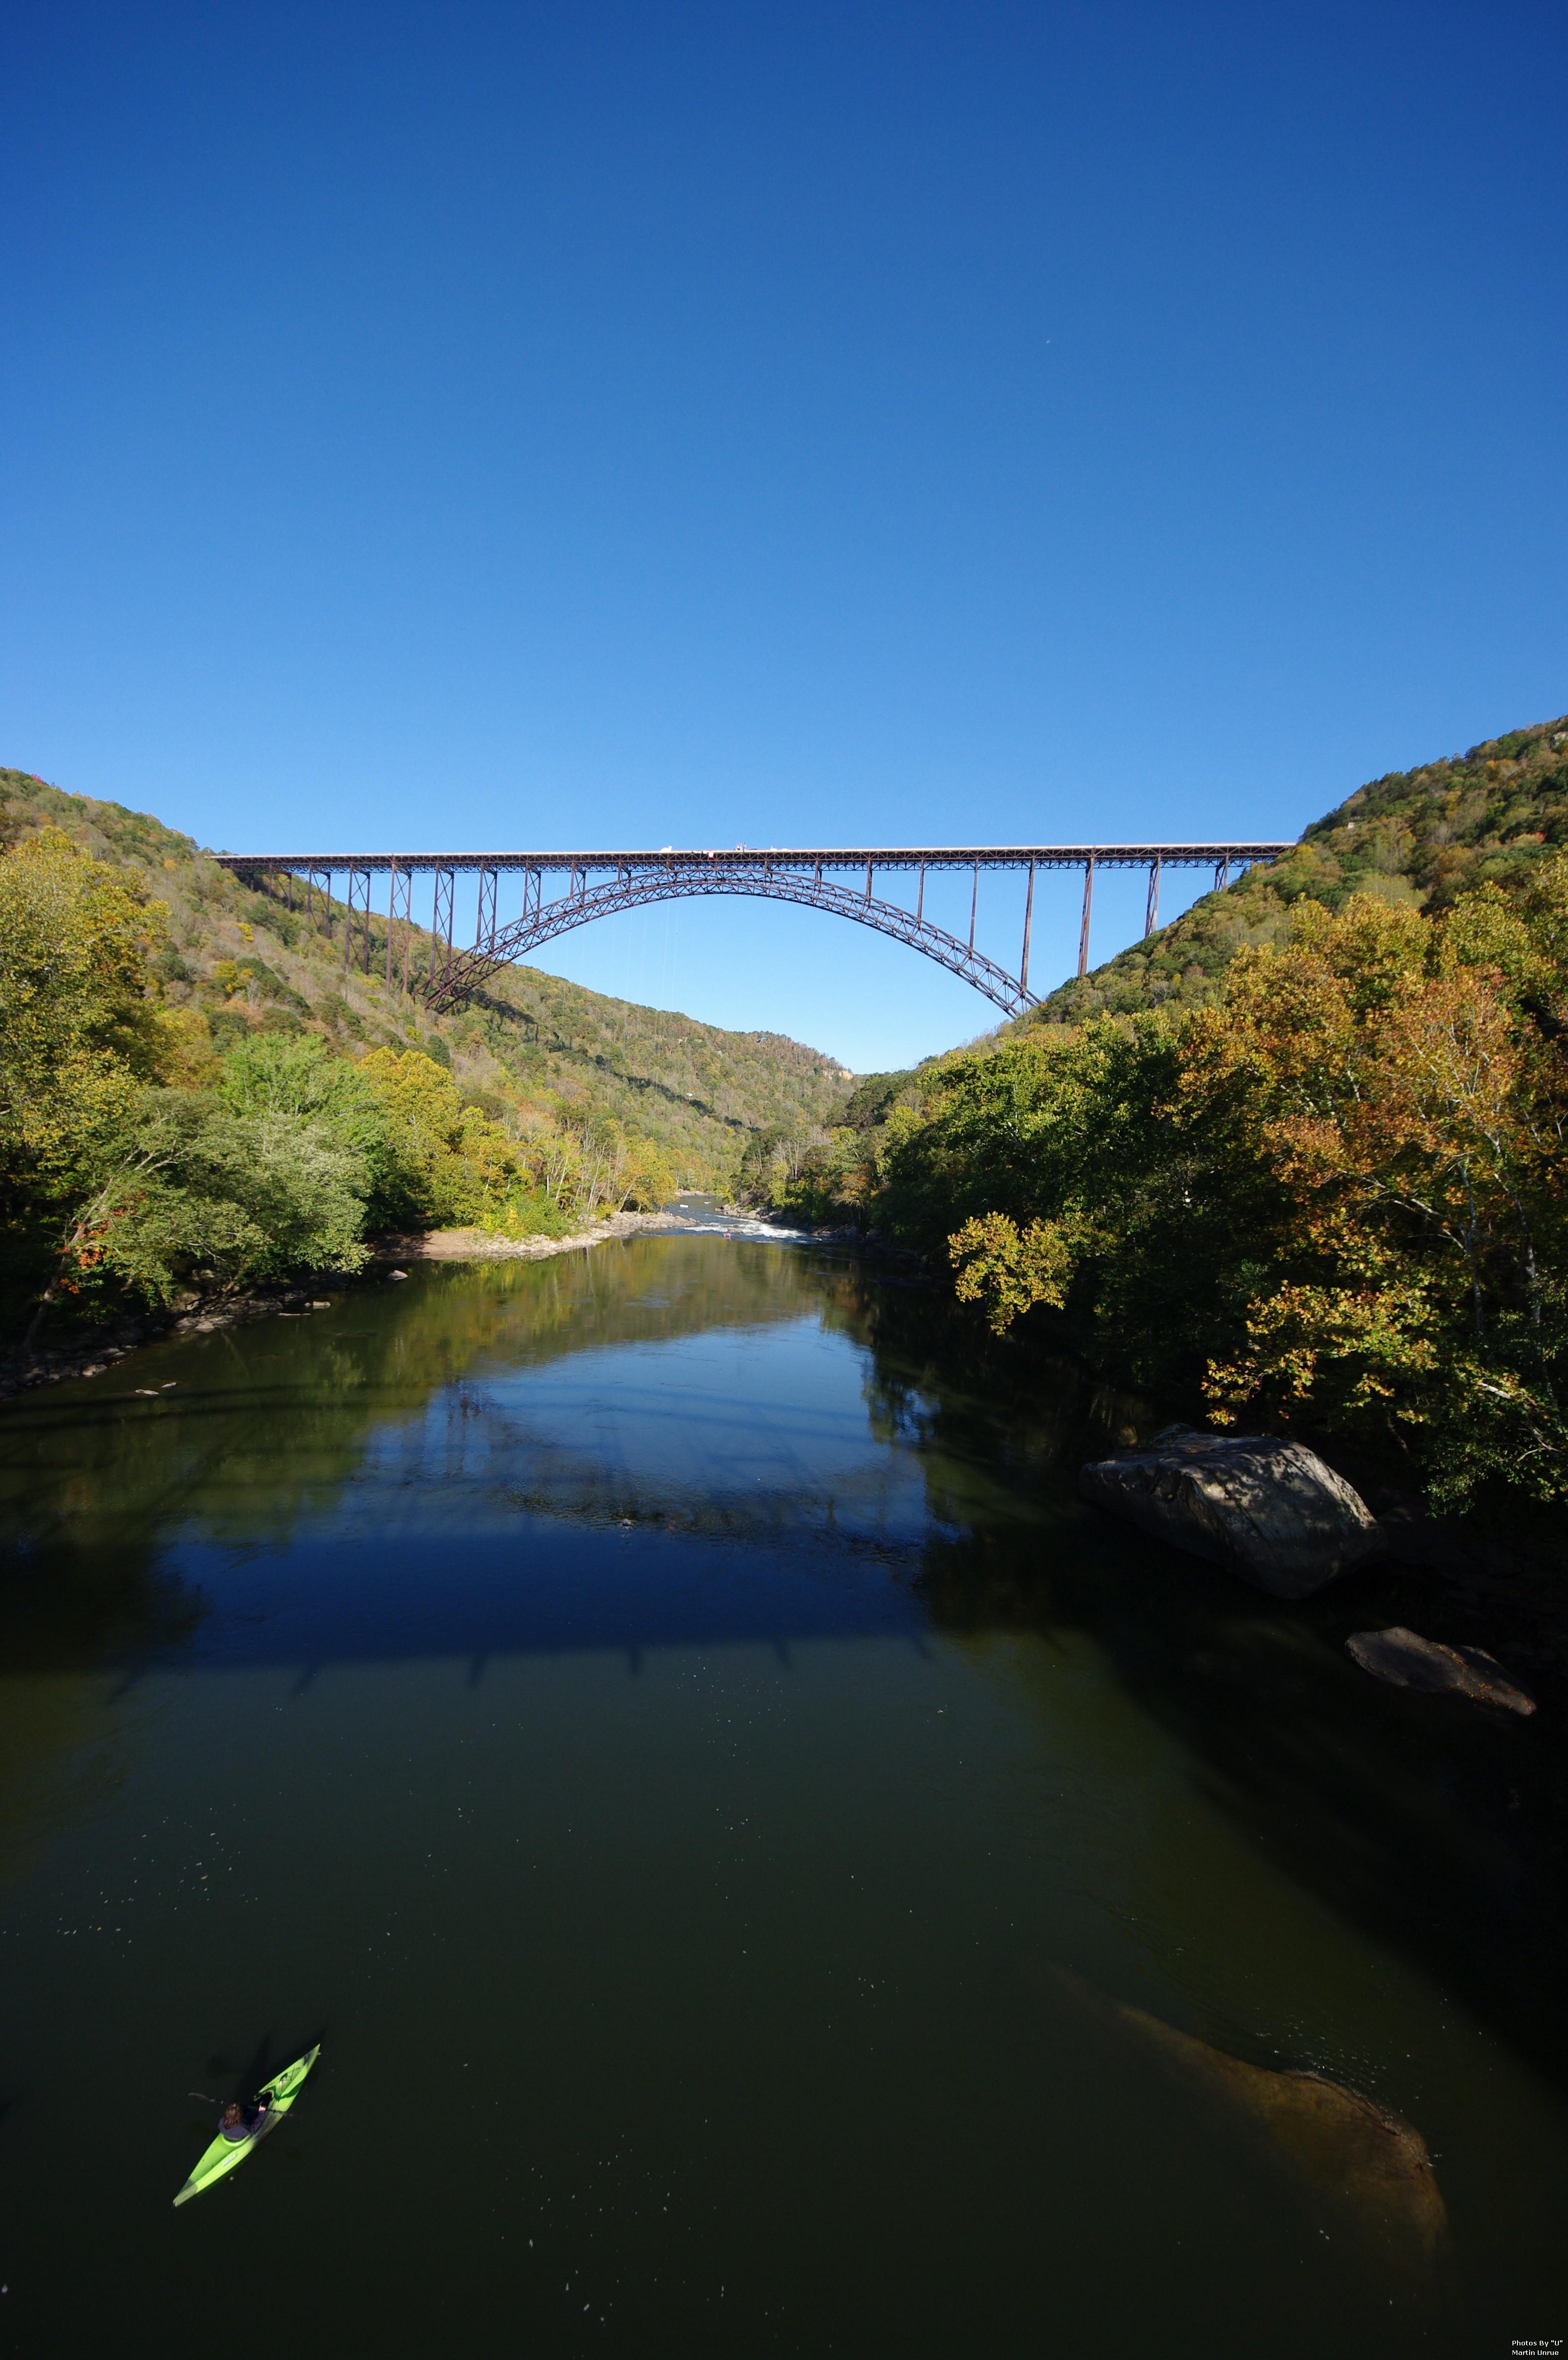 New River Bridge West Virginia Bridge West Virginia.jpg